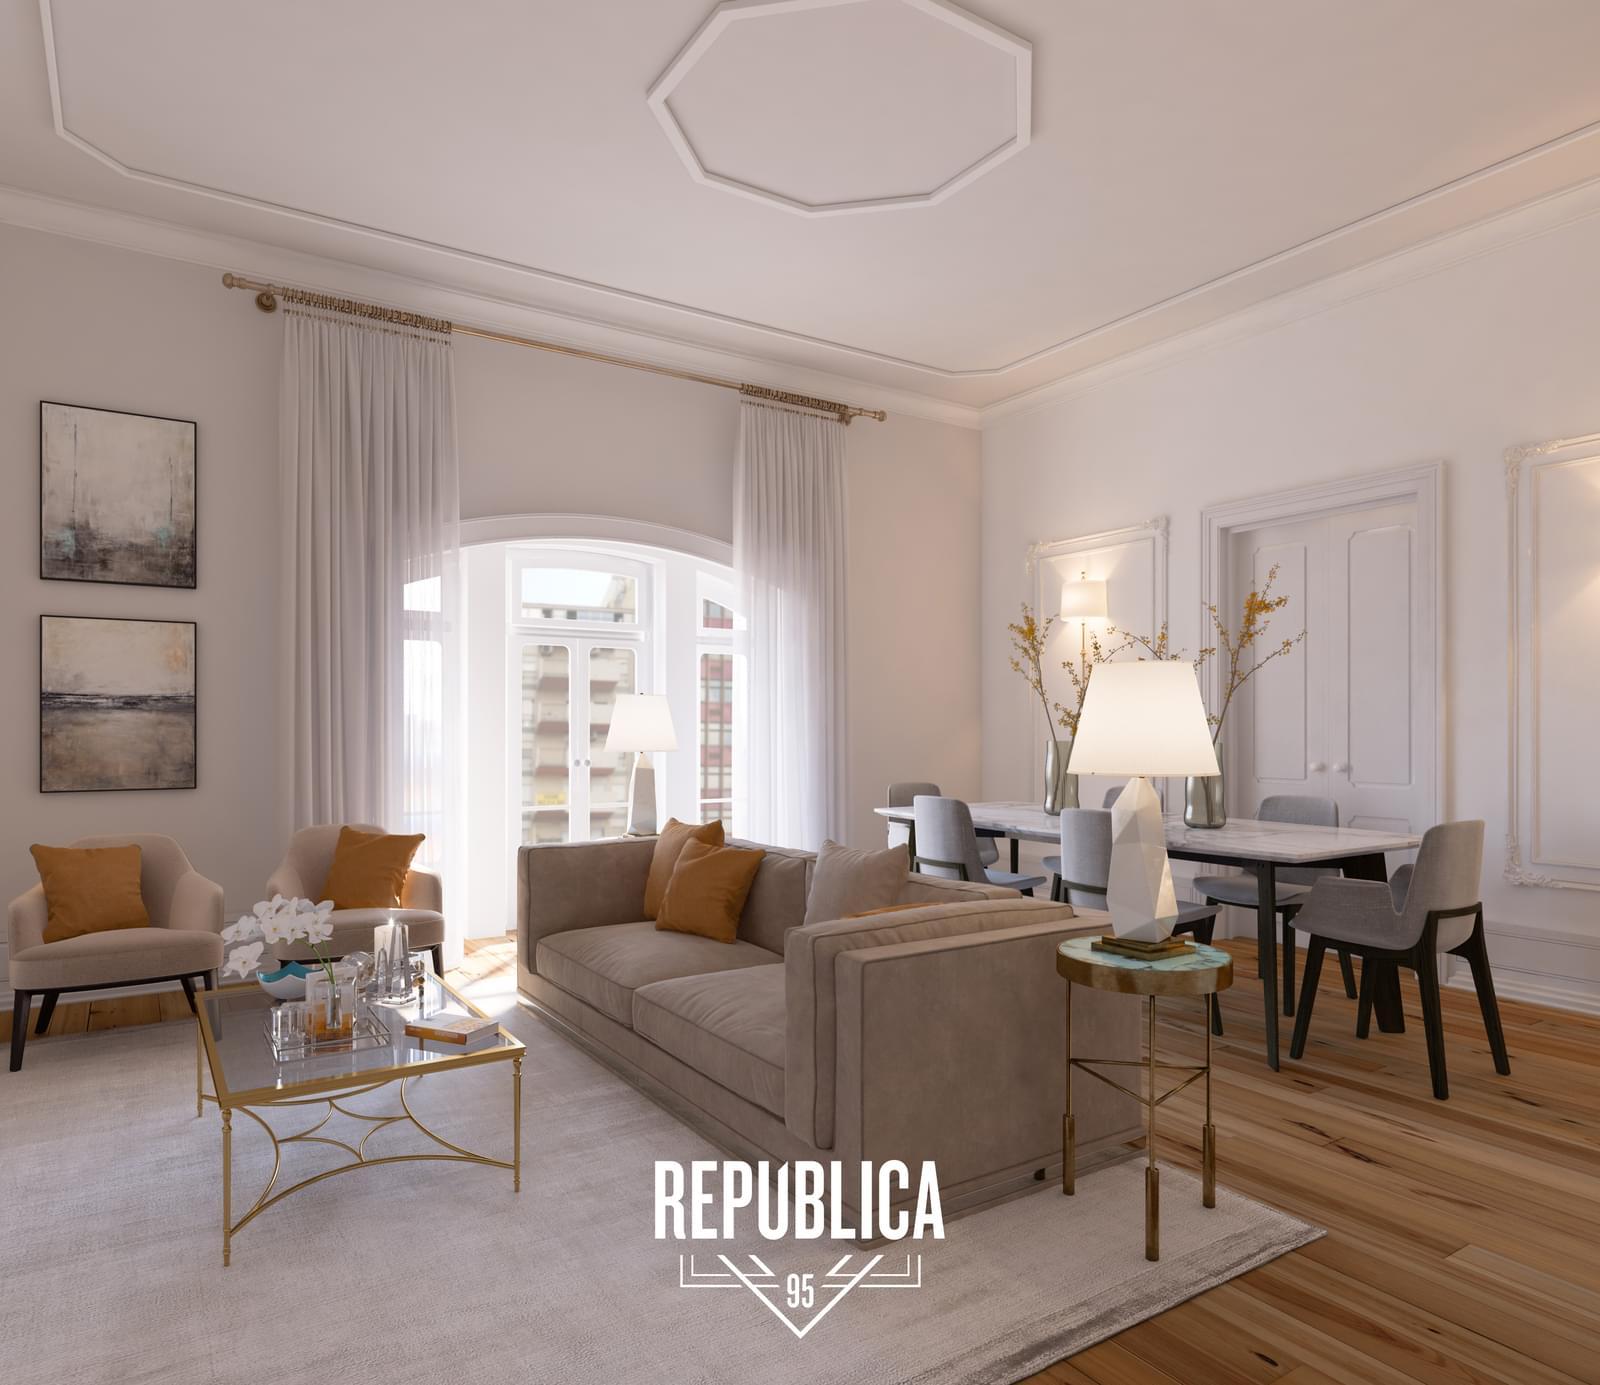 PF22022, Apartamento T1, Lisboa